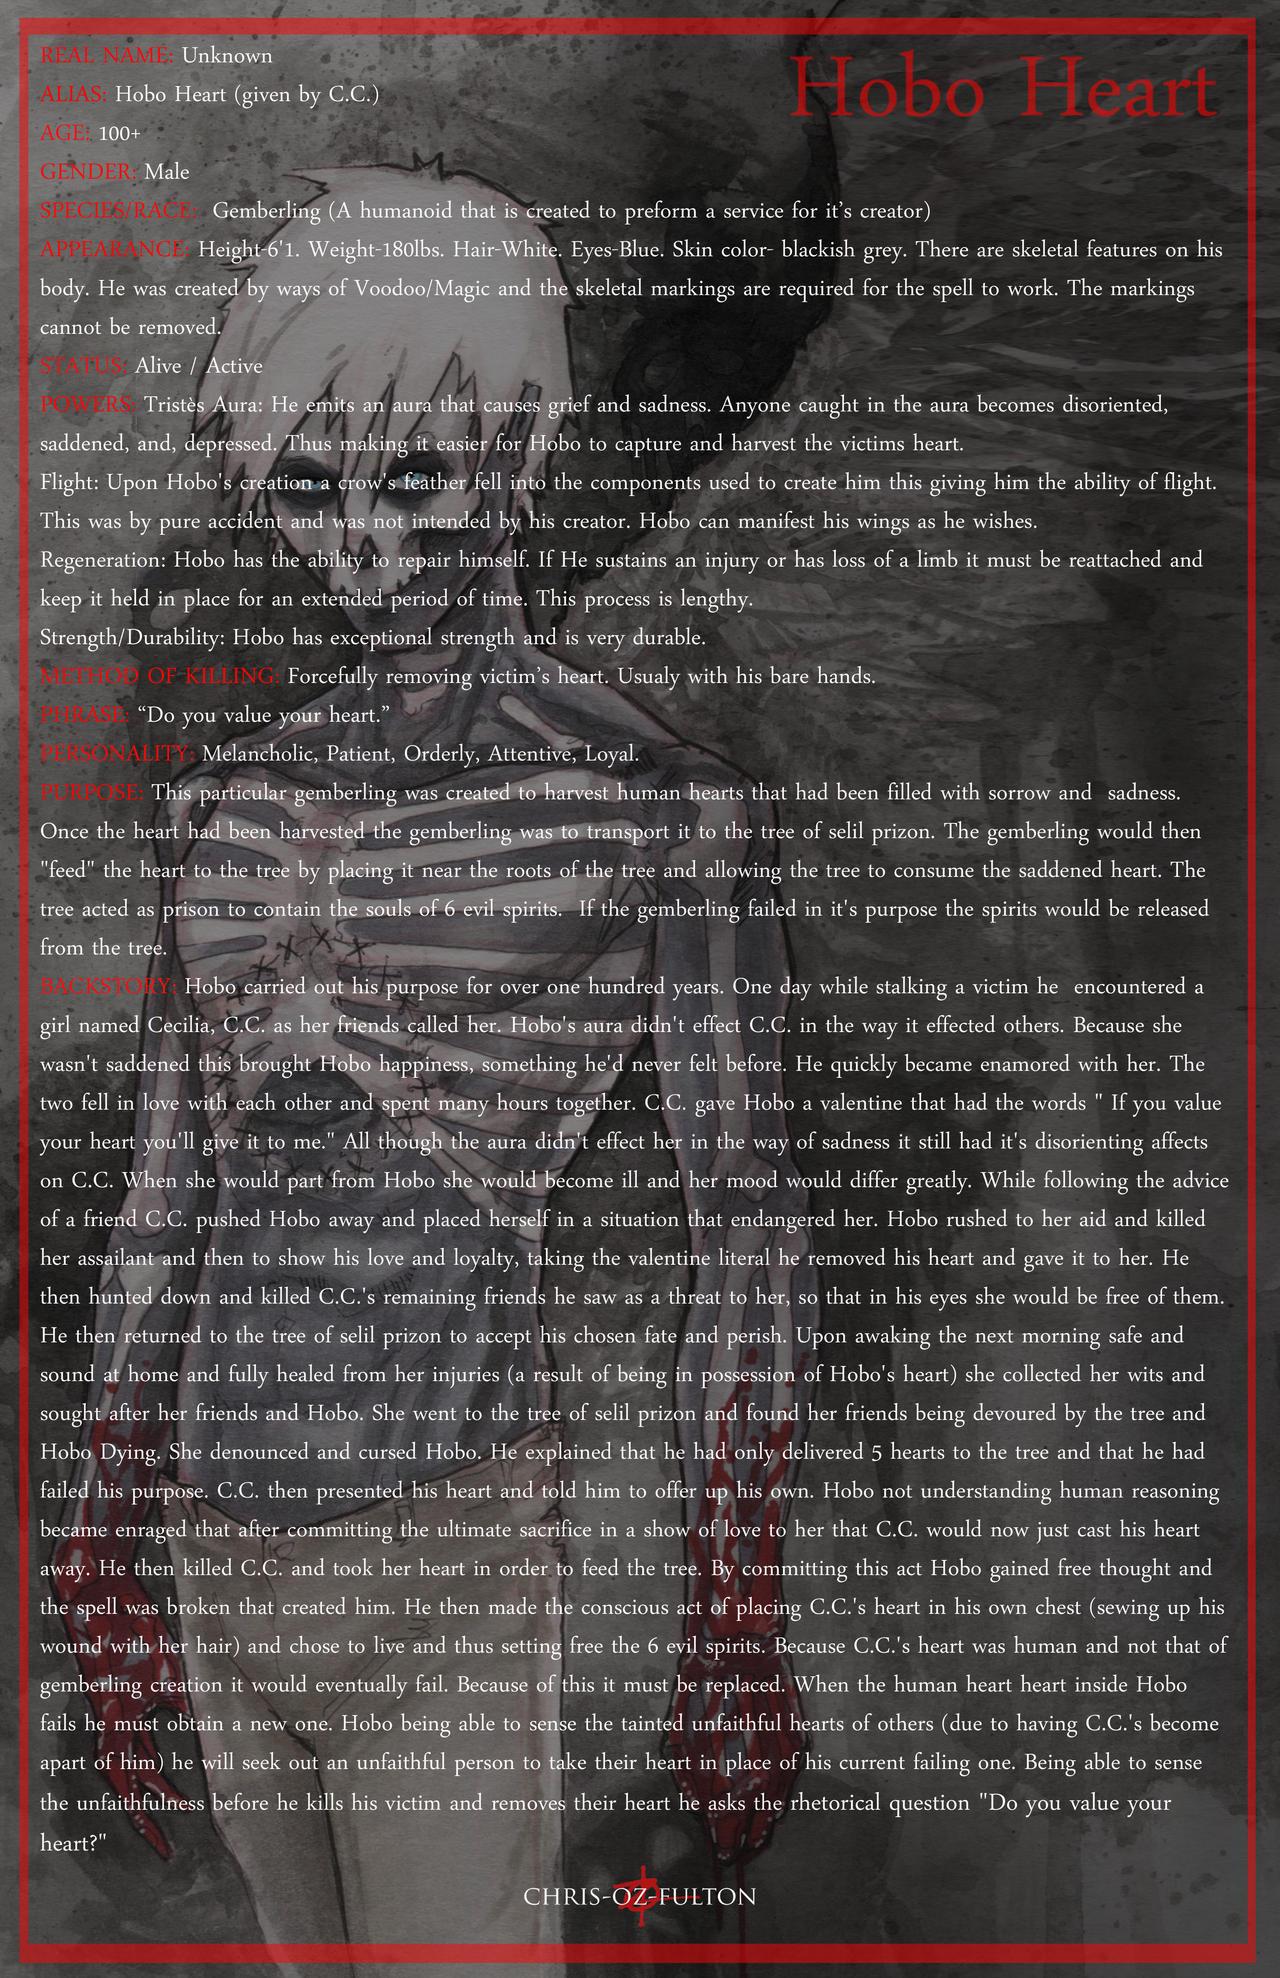 Hobo Heart Creepypasta Character Sheet by ChrisOzFulton